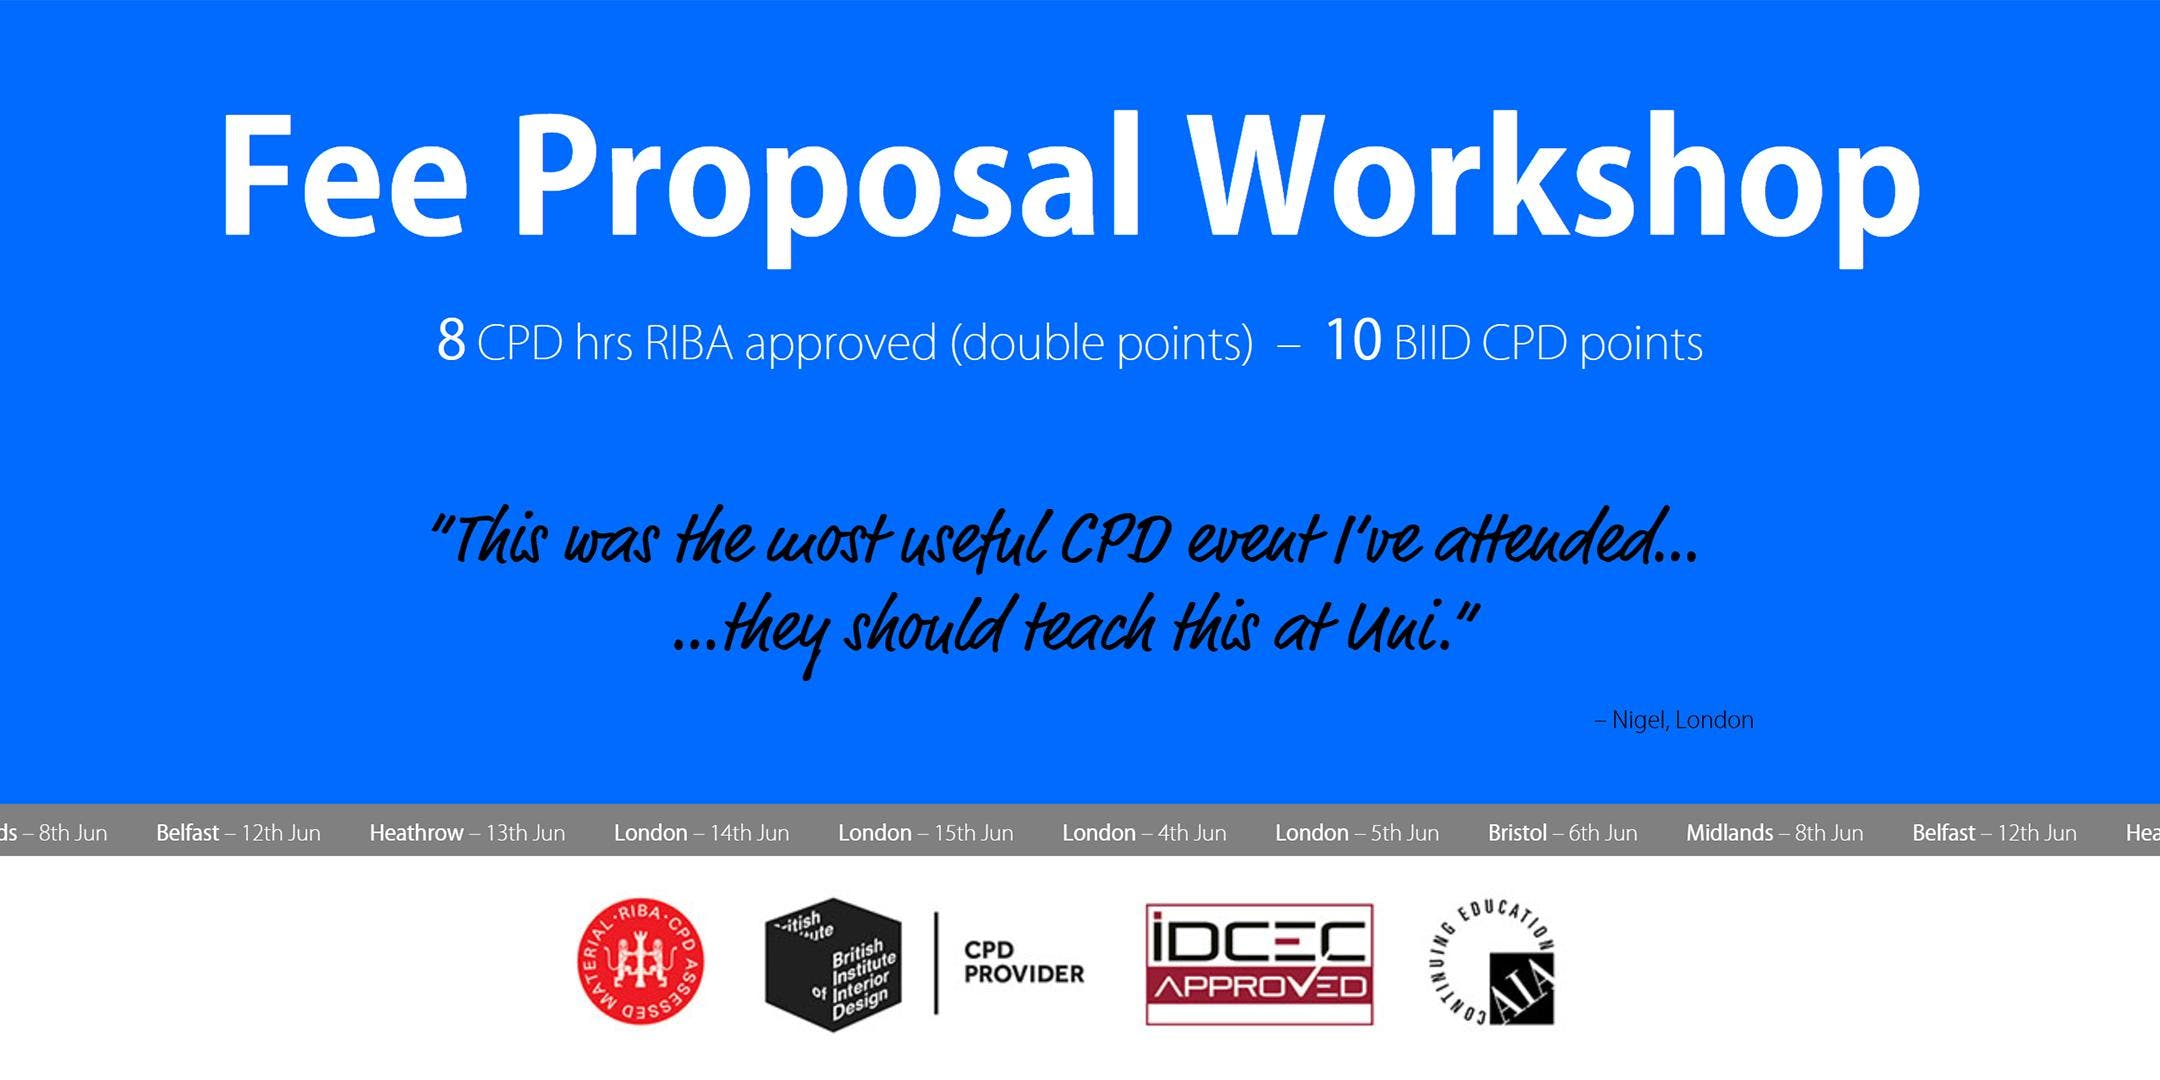 London Fee Proposal Workshop